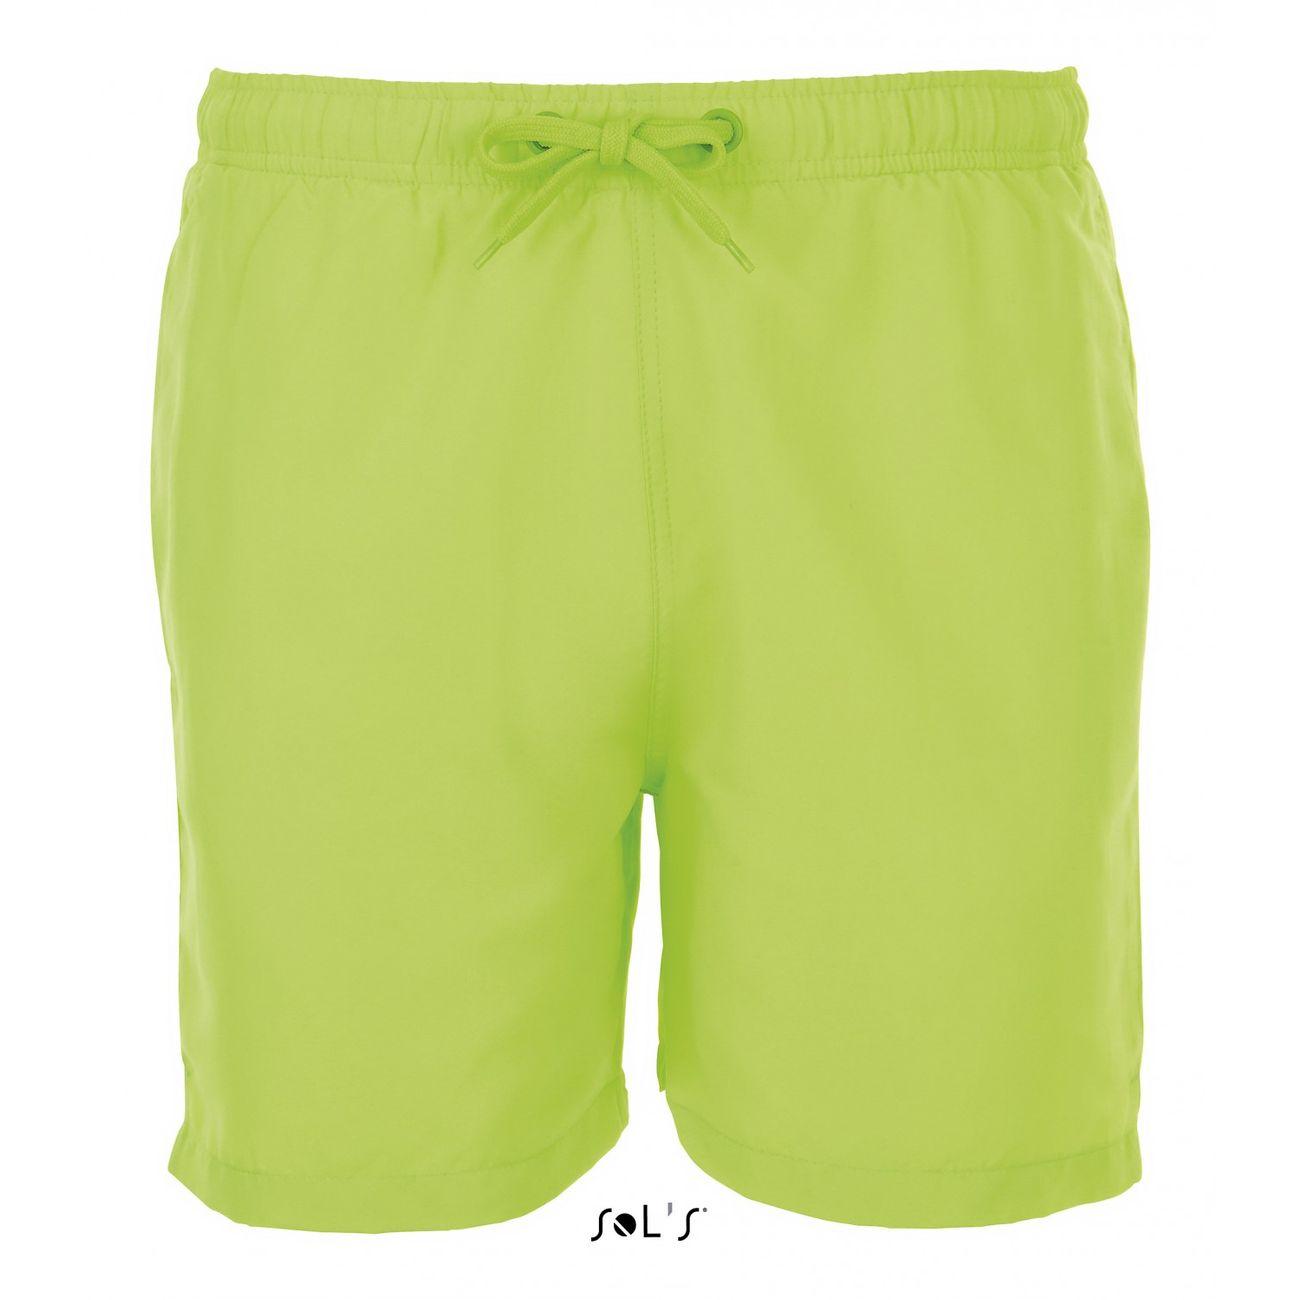 Natation homme SOL S Short de bain Homme - 01689 vert fluo